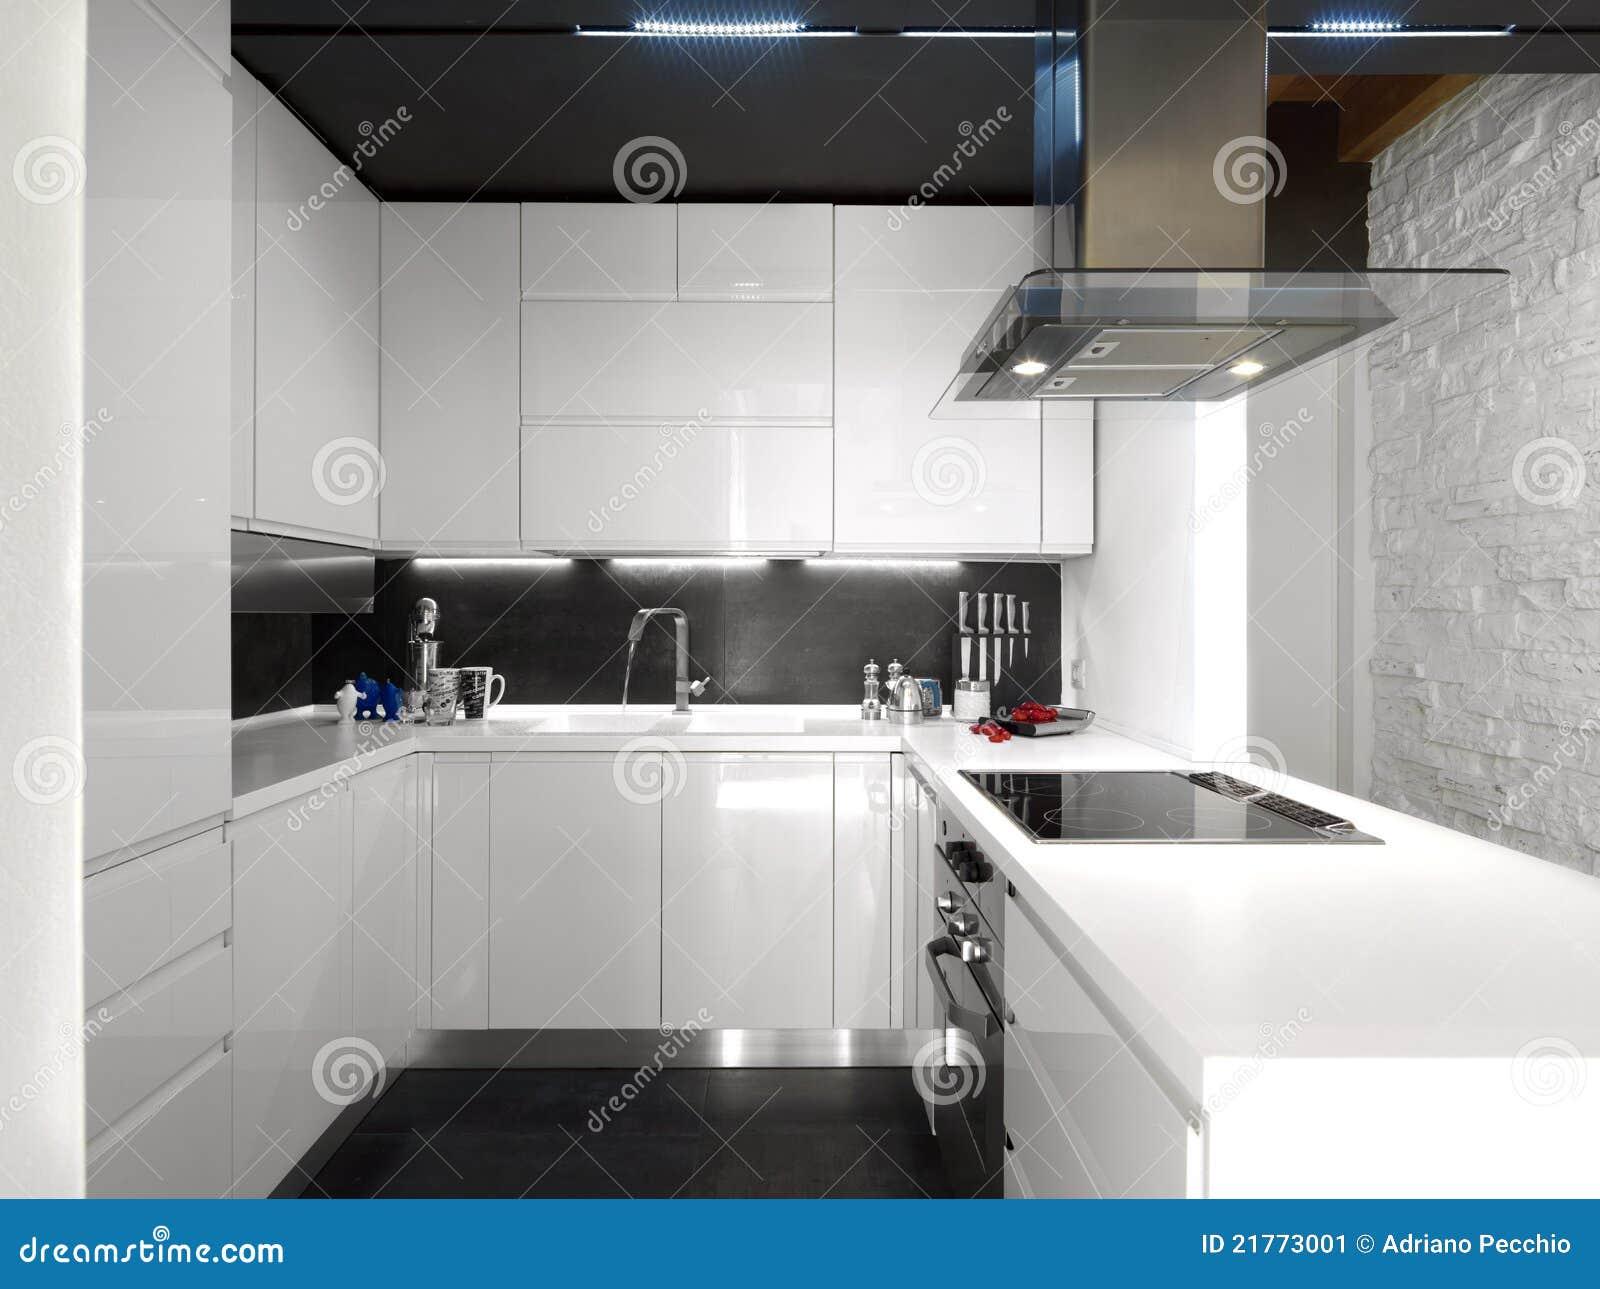 Cucina moderna bianca con gli apparecchi d 39 acciaio for Cucina moderna nera e bianca